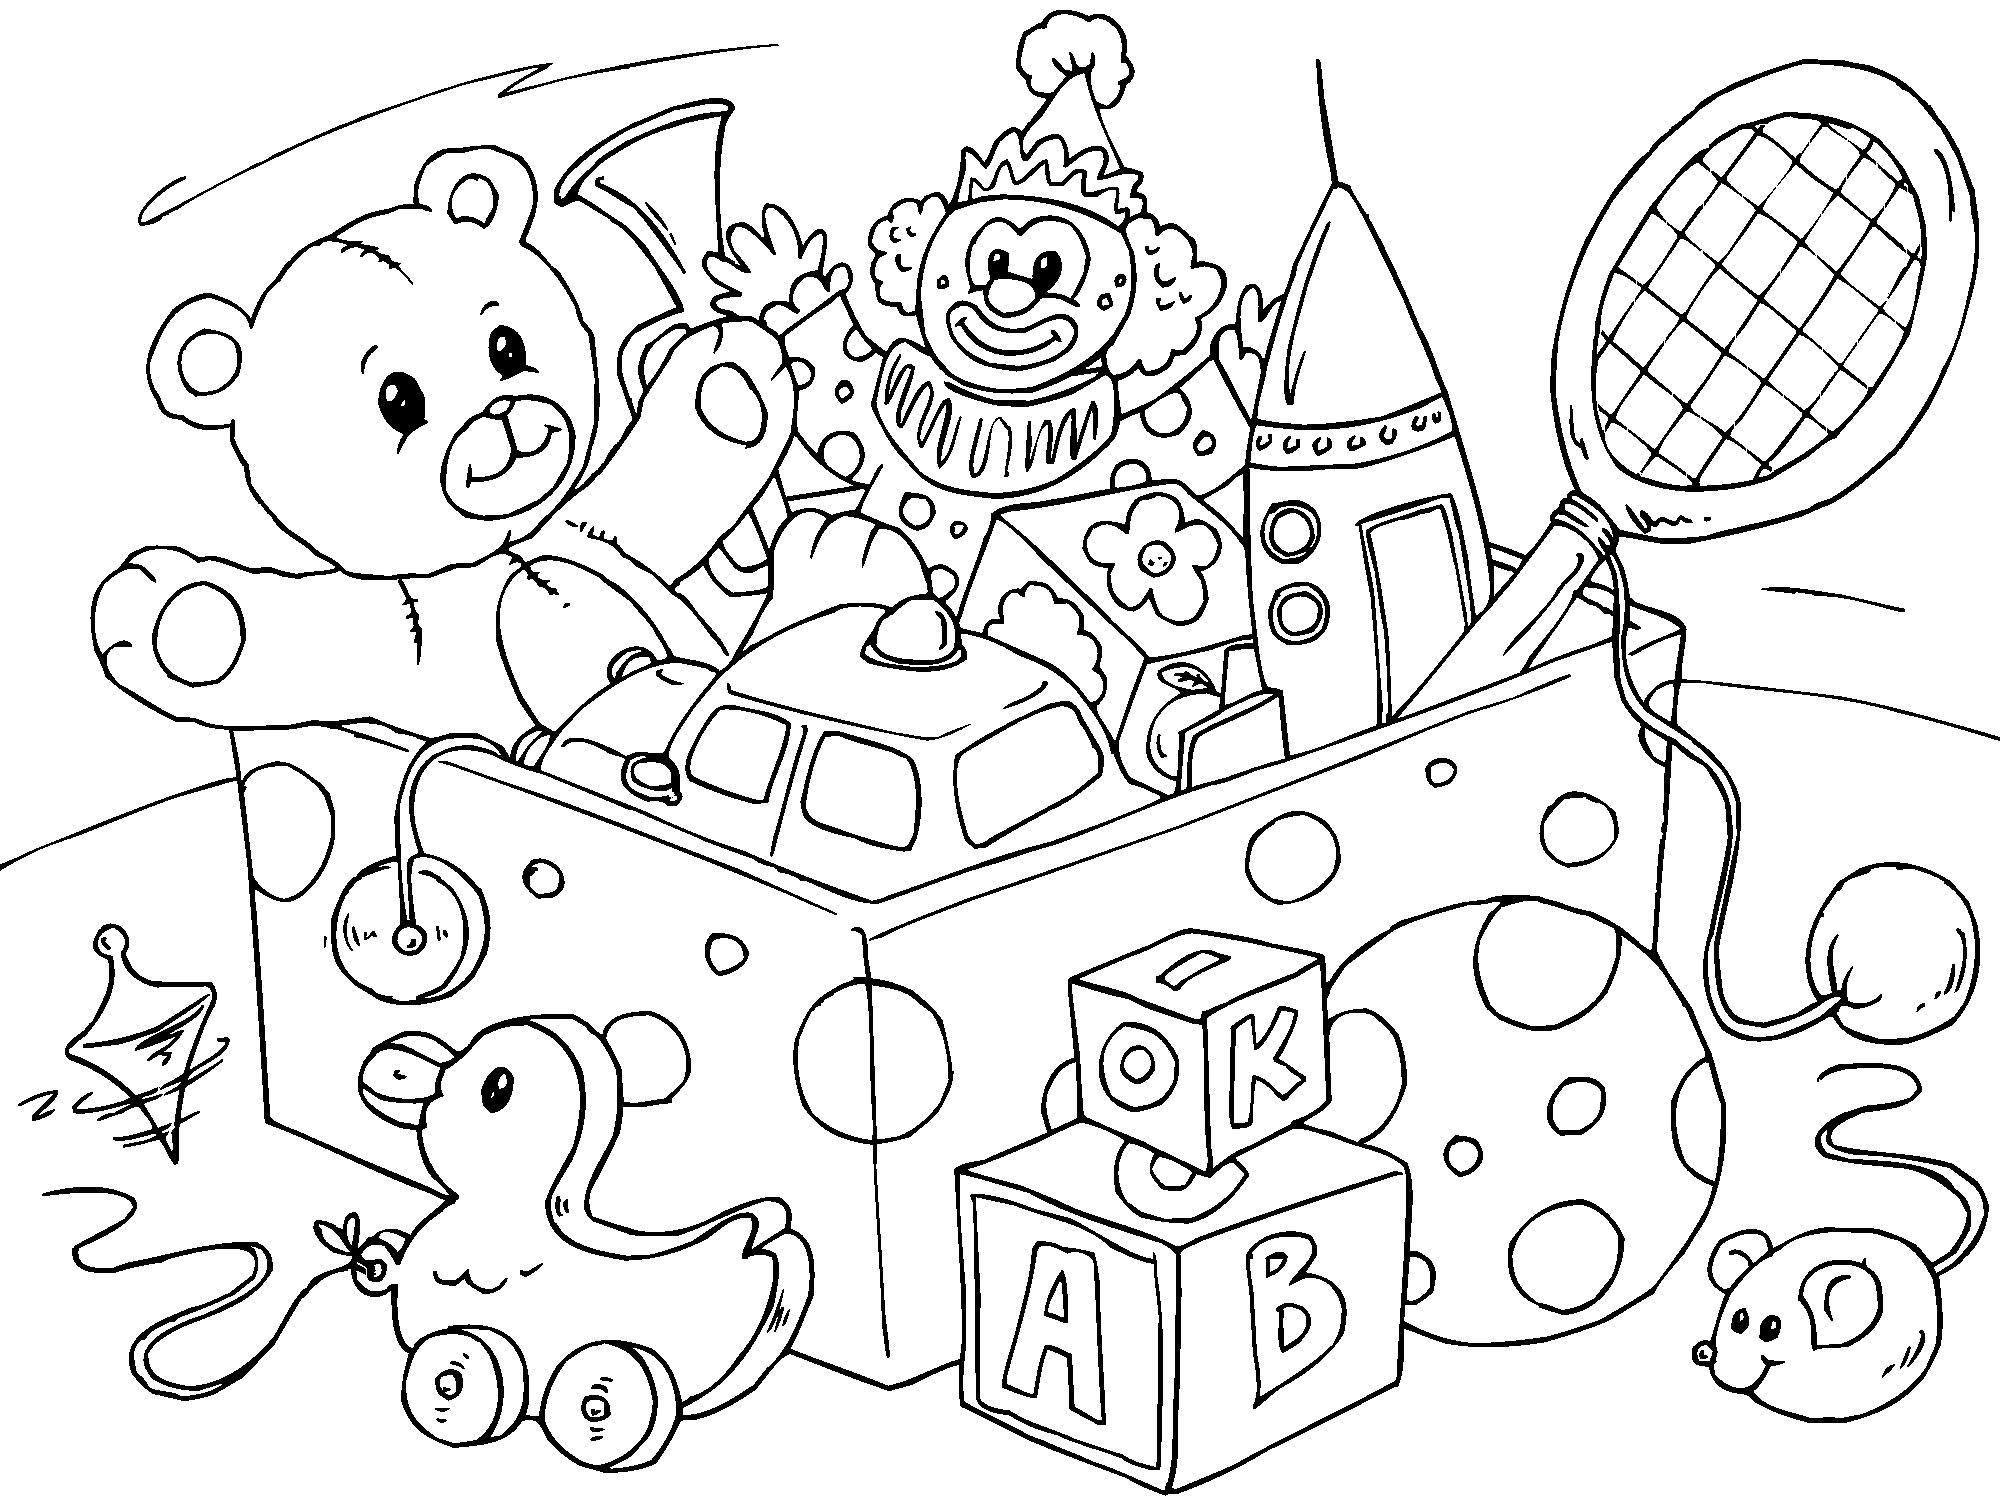 Dibujo para colorear juguetes - Img 22827